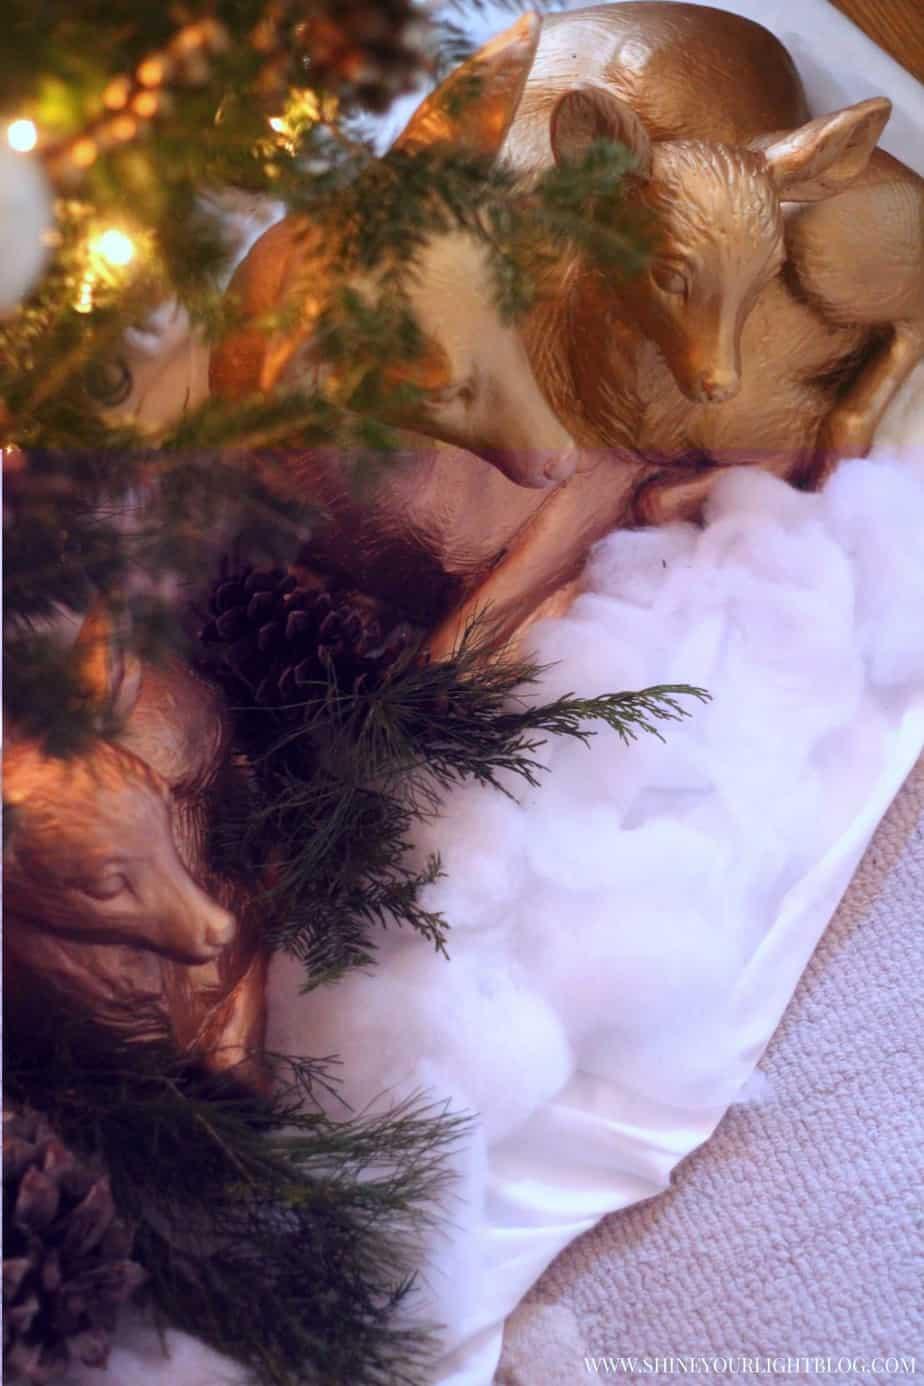 Golden deer nestled under a woodland Christmas tree